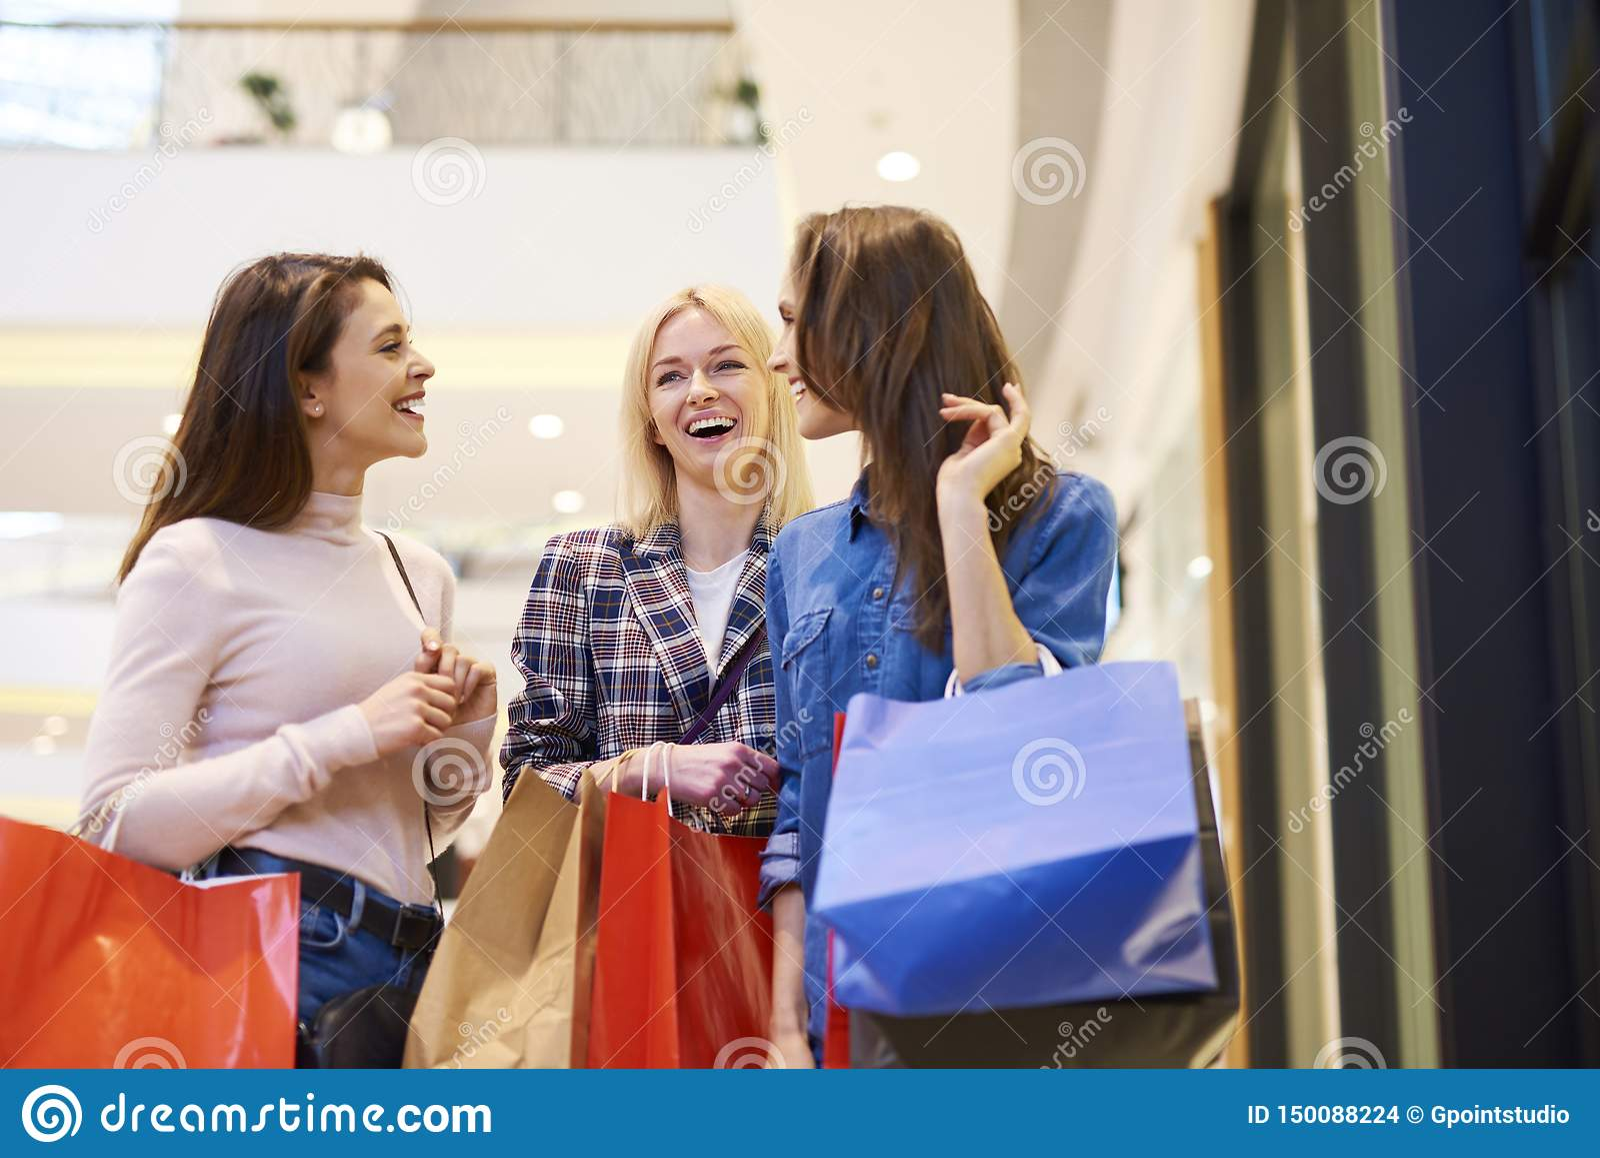 Three girls enjoying the shopping in the shopping mall